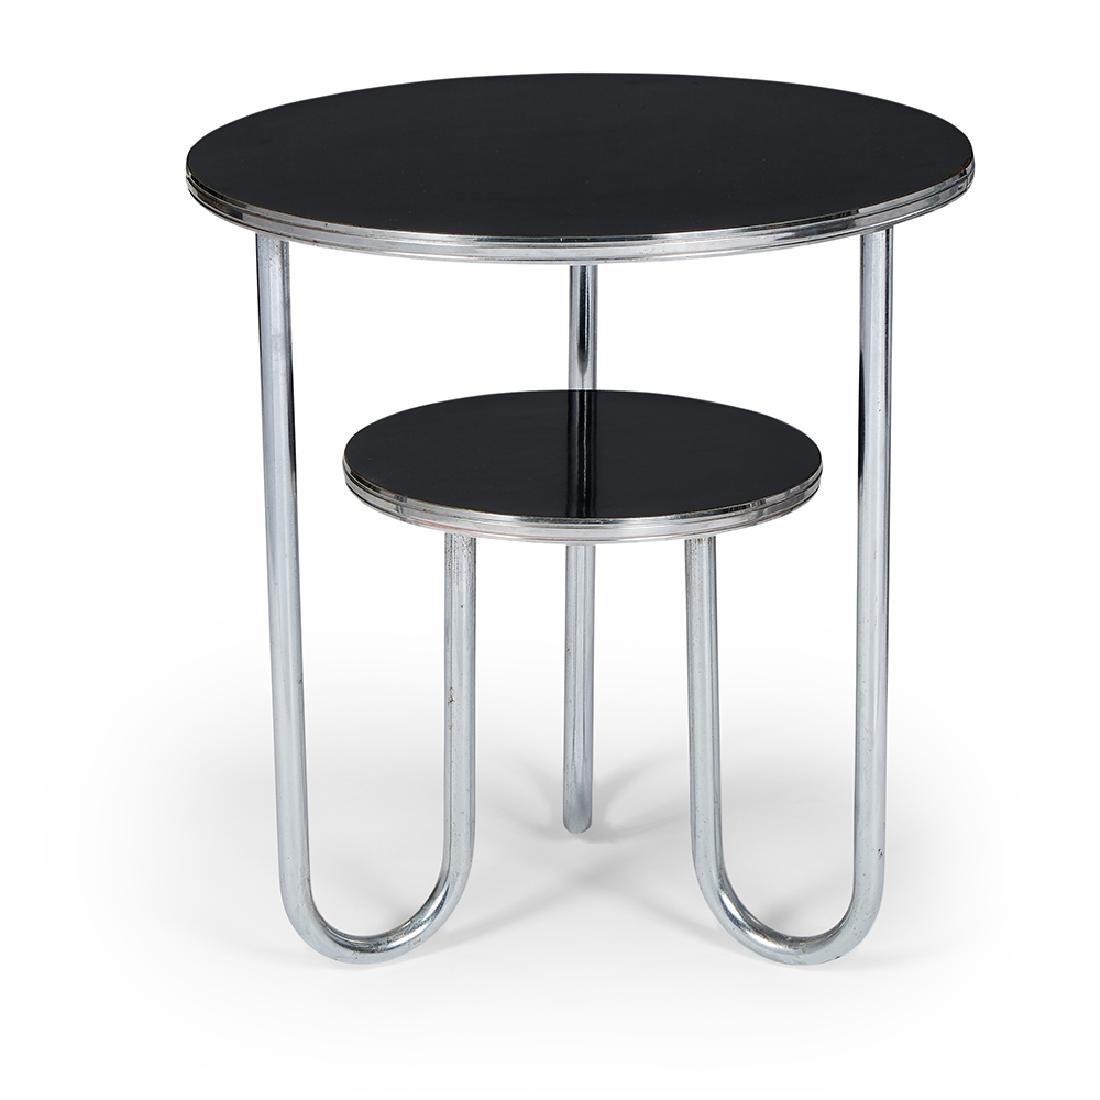 Royalchrome table